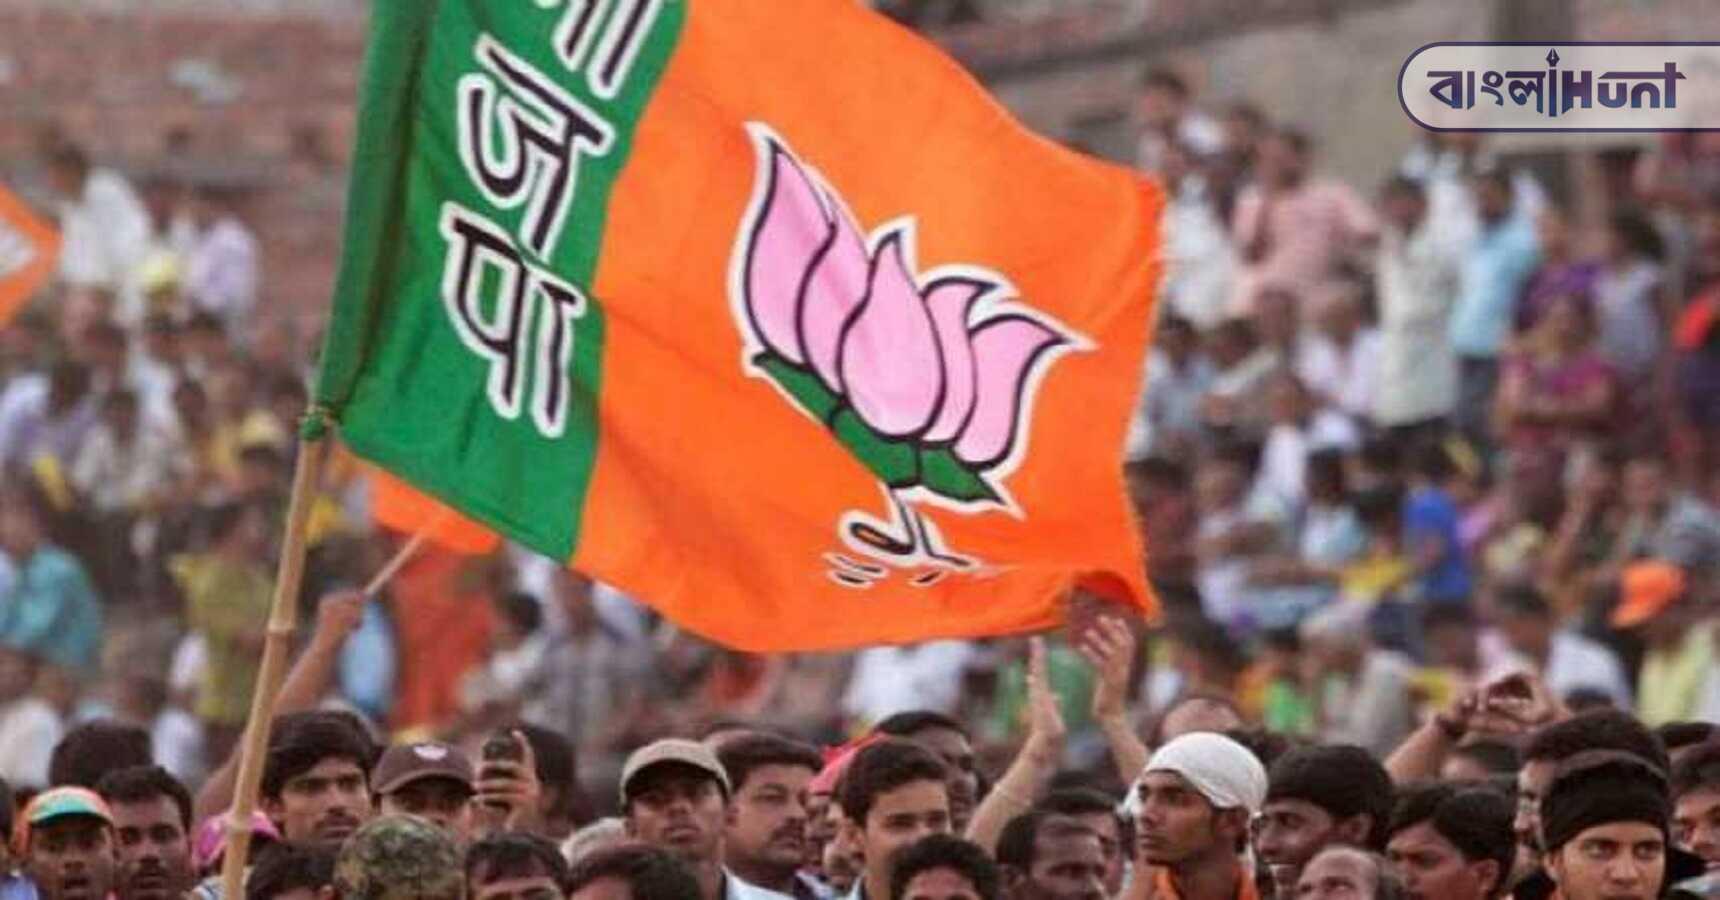 BJP's big success: 98 leftist members enlist in bjp in Kerala